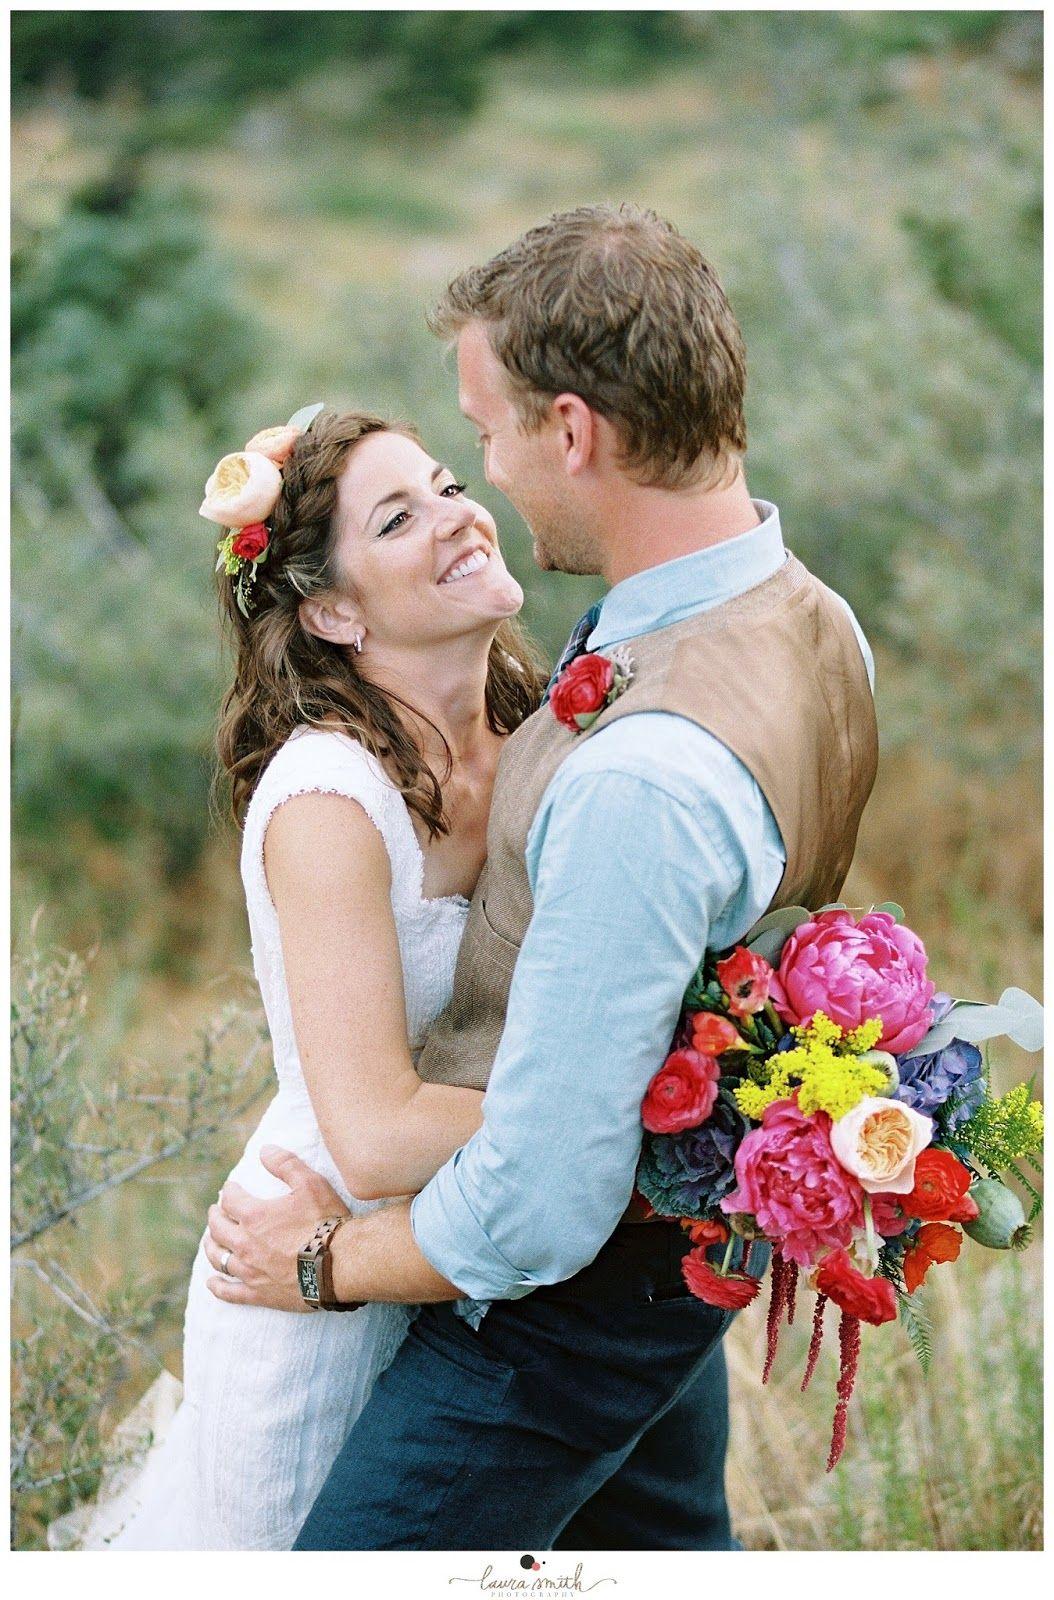 Laura Smith Photography: Colorado Wedding Photographer, bridal poses, bride and groom posing, peonies, bouquet, details, shoes, film, Kodak Portra 160, www.laurasmithphotos.com